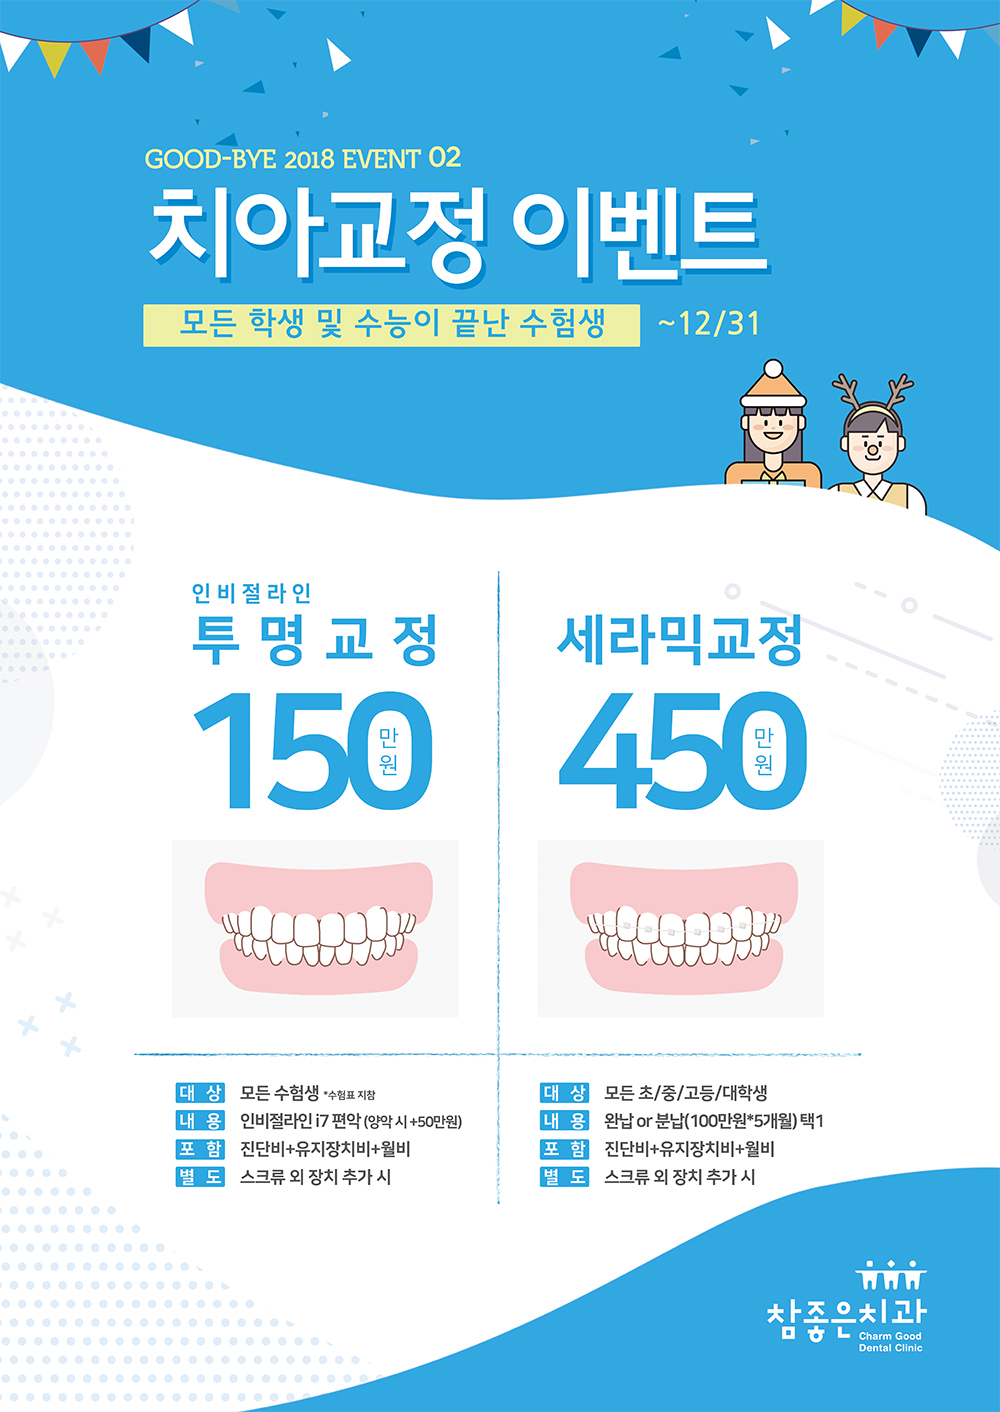 endofyear_2018_orthodontic.jpg